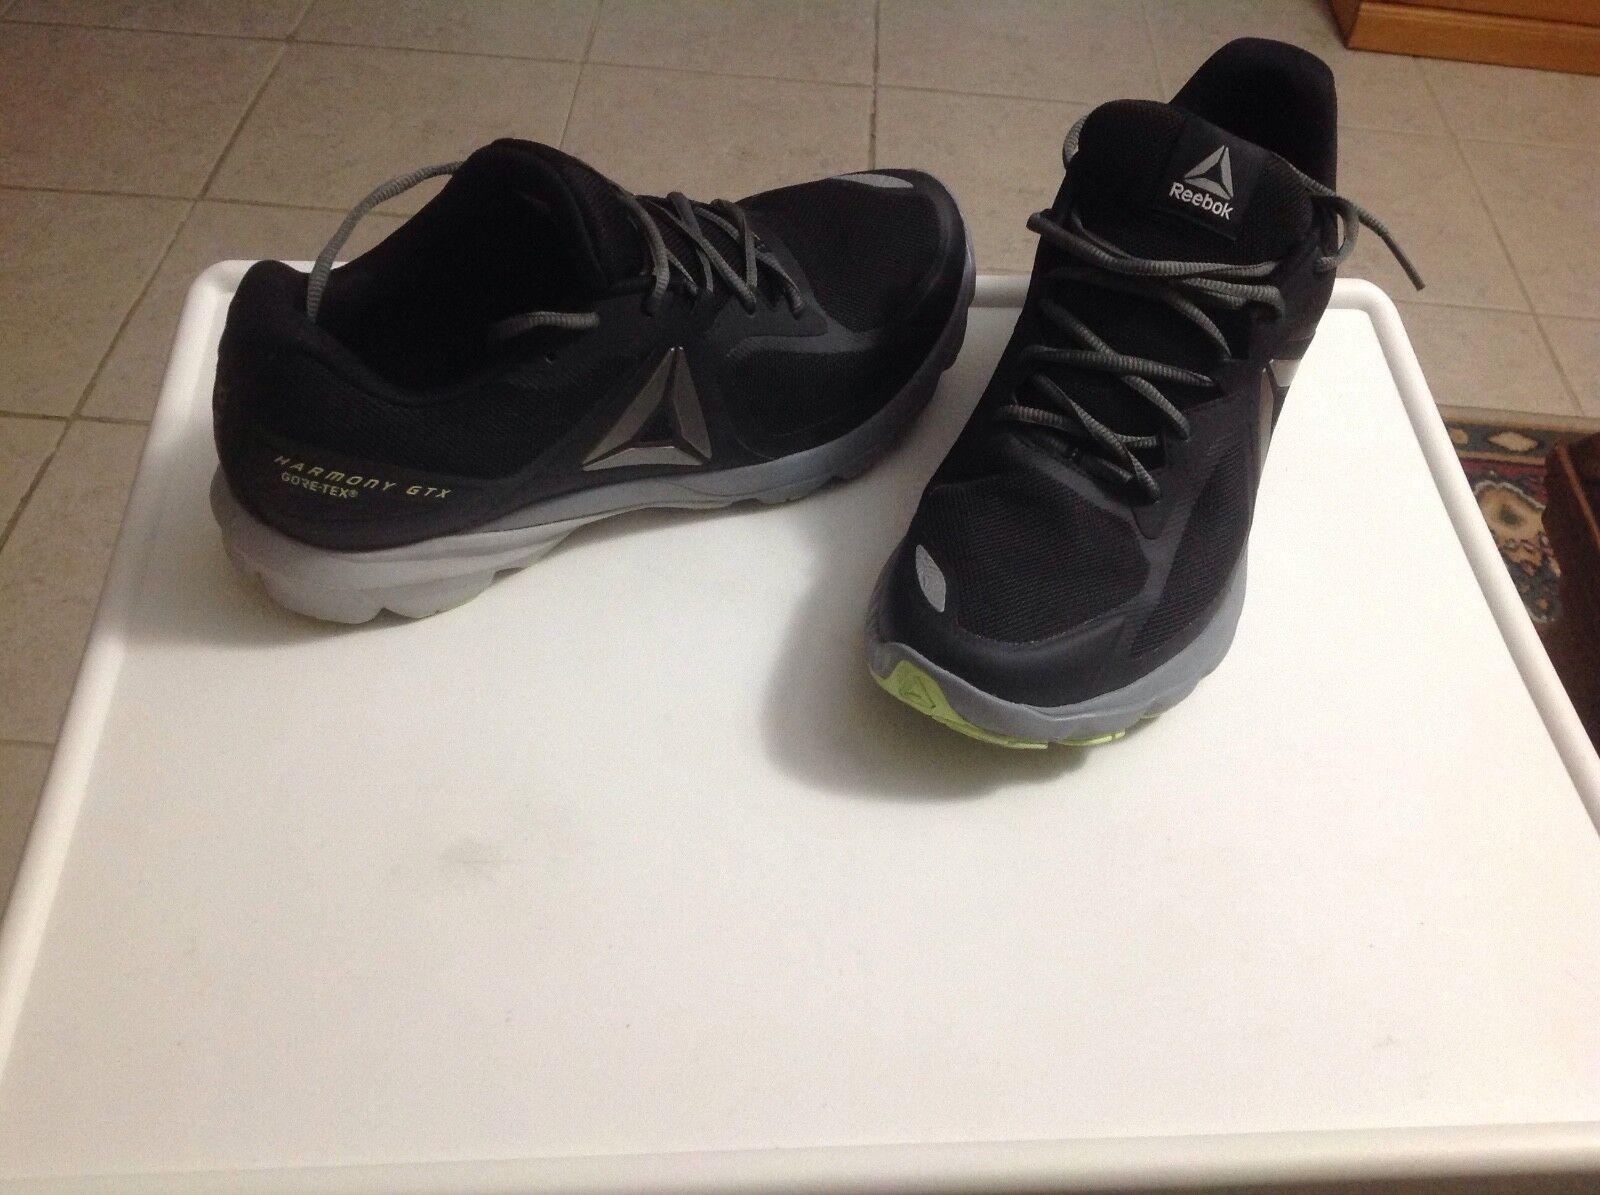 M Reebok athletic sneakers (size 11)